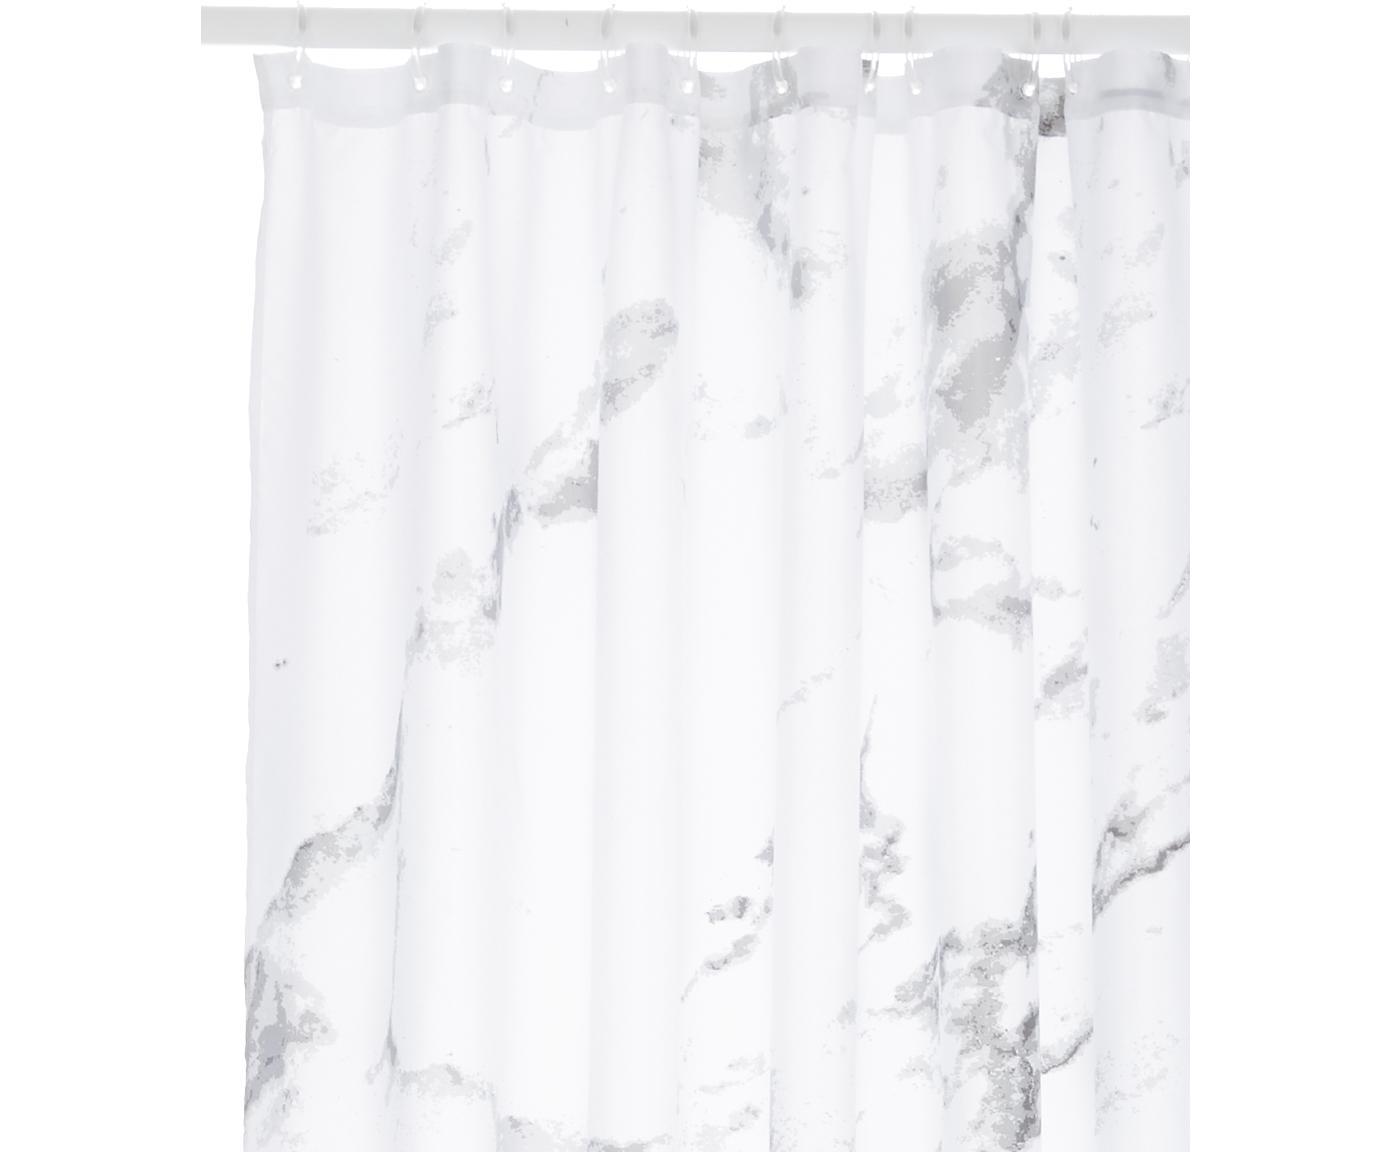 Cortina de baño Marble, Poliéster Repelente al agua, no impermeable, Gris antracita, blanco, An 180 x L 200 cm